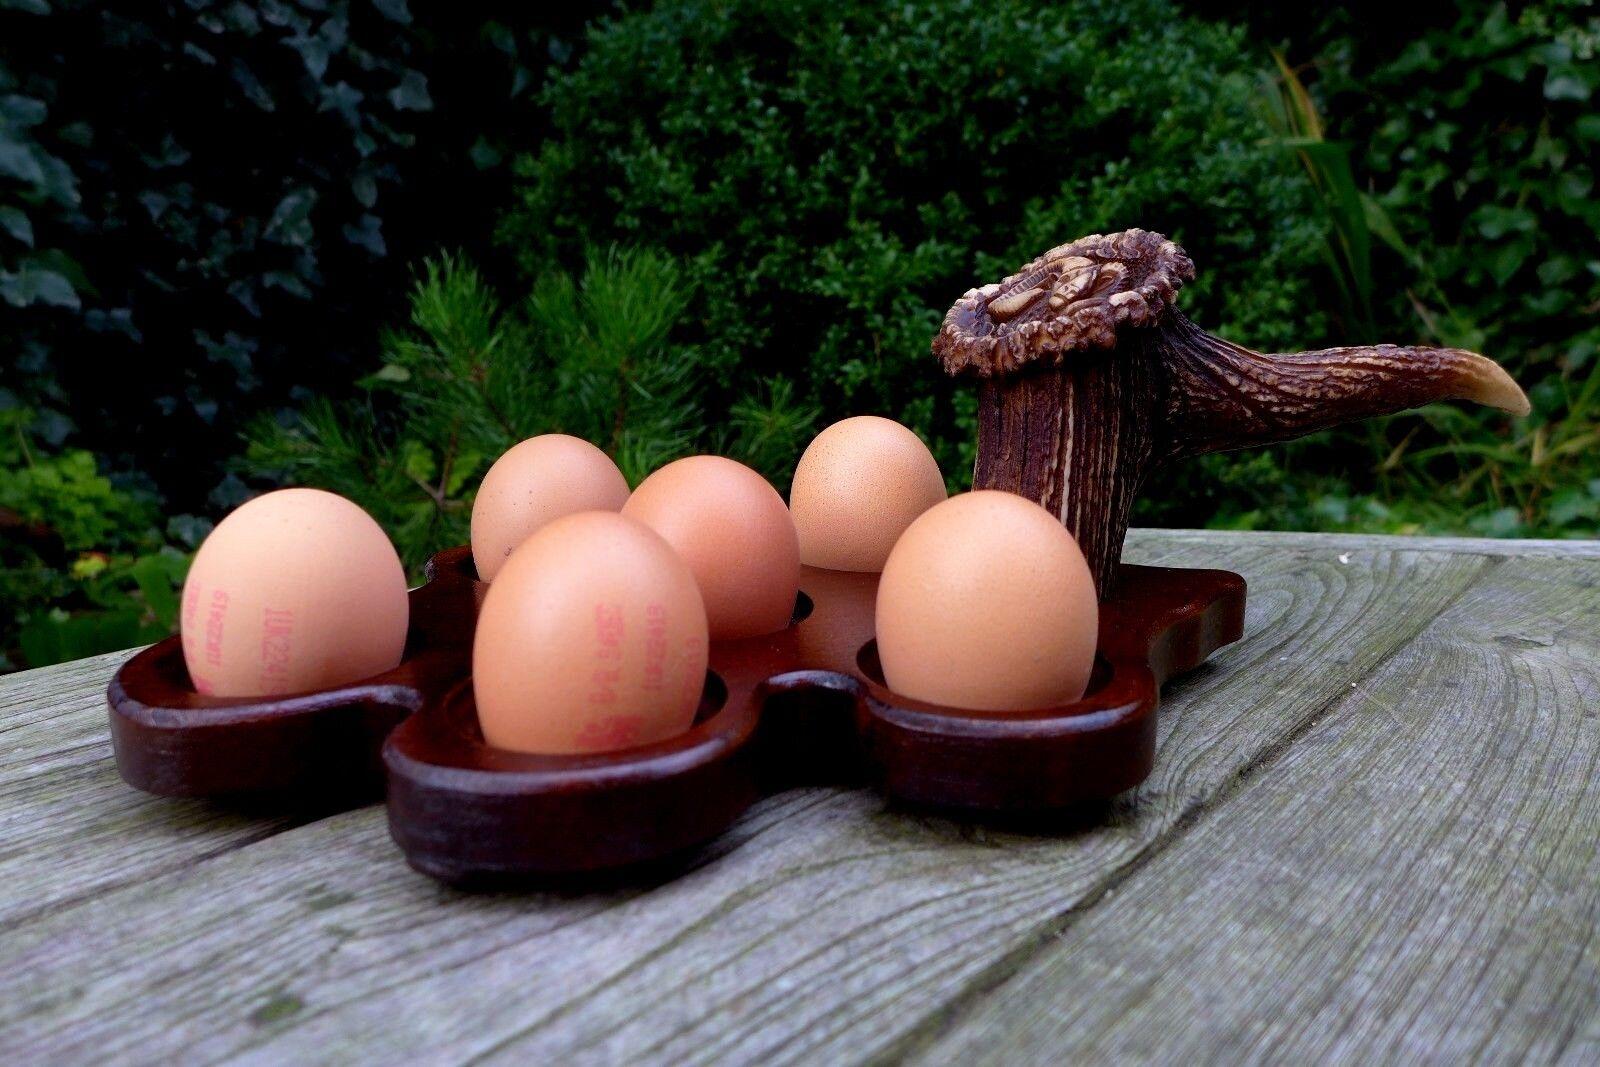 Egg Holder Handmade & Handcrafted Support pour 6 oeufs Une copie du cerf Poignée